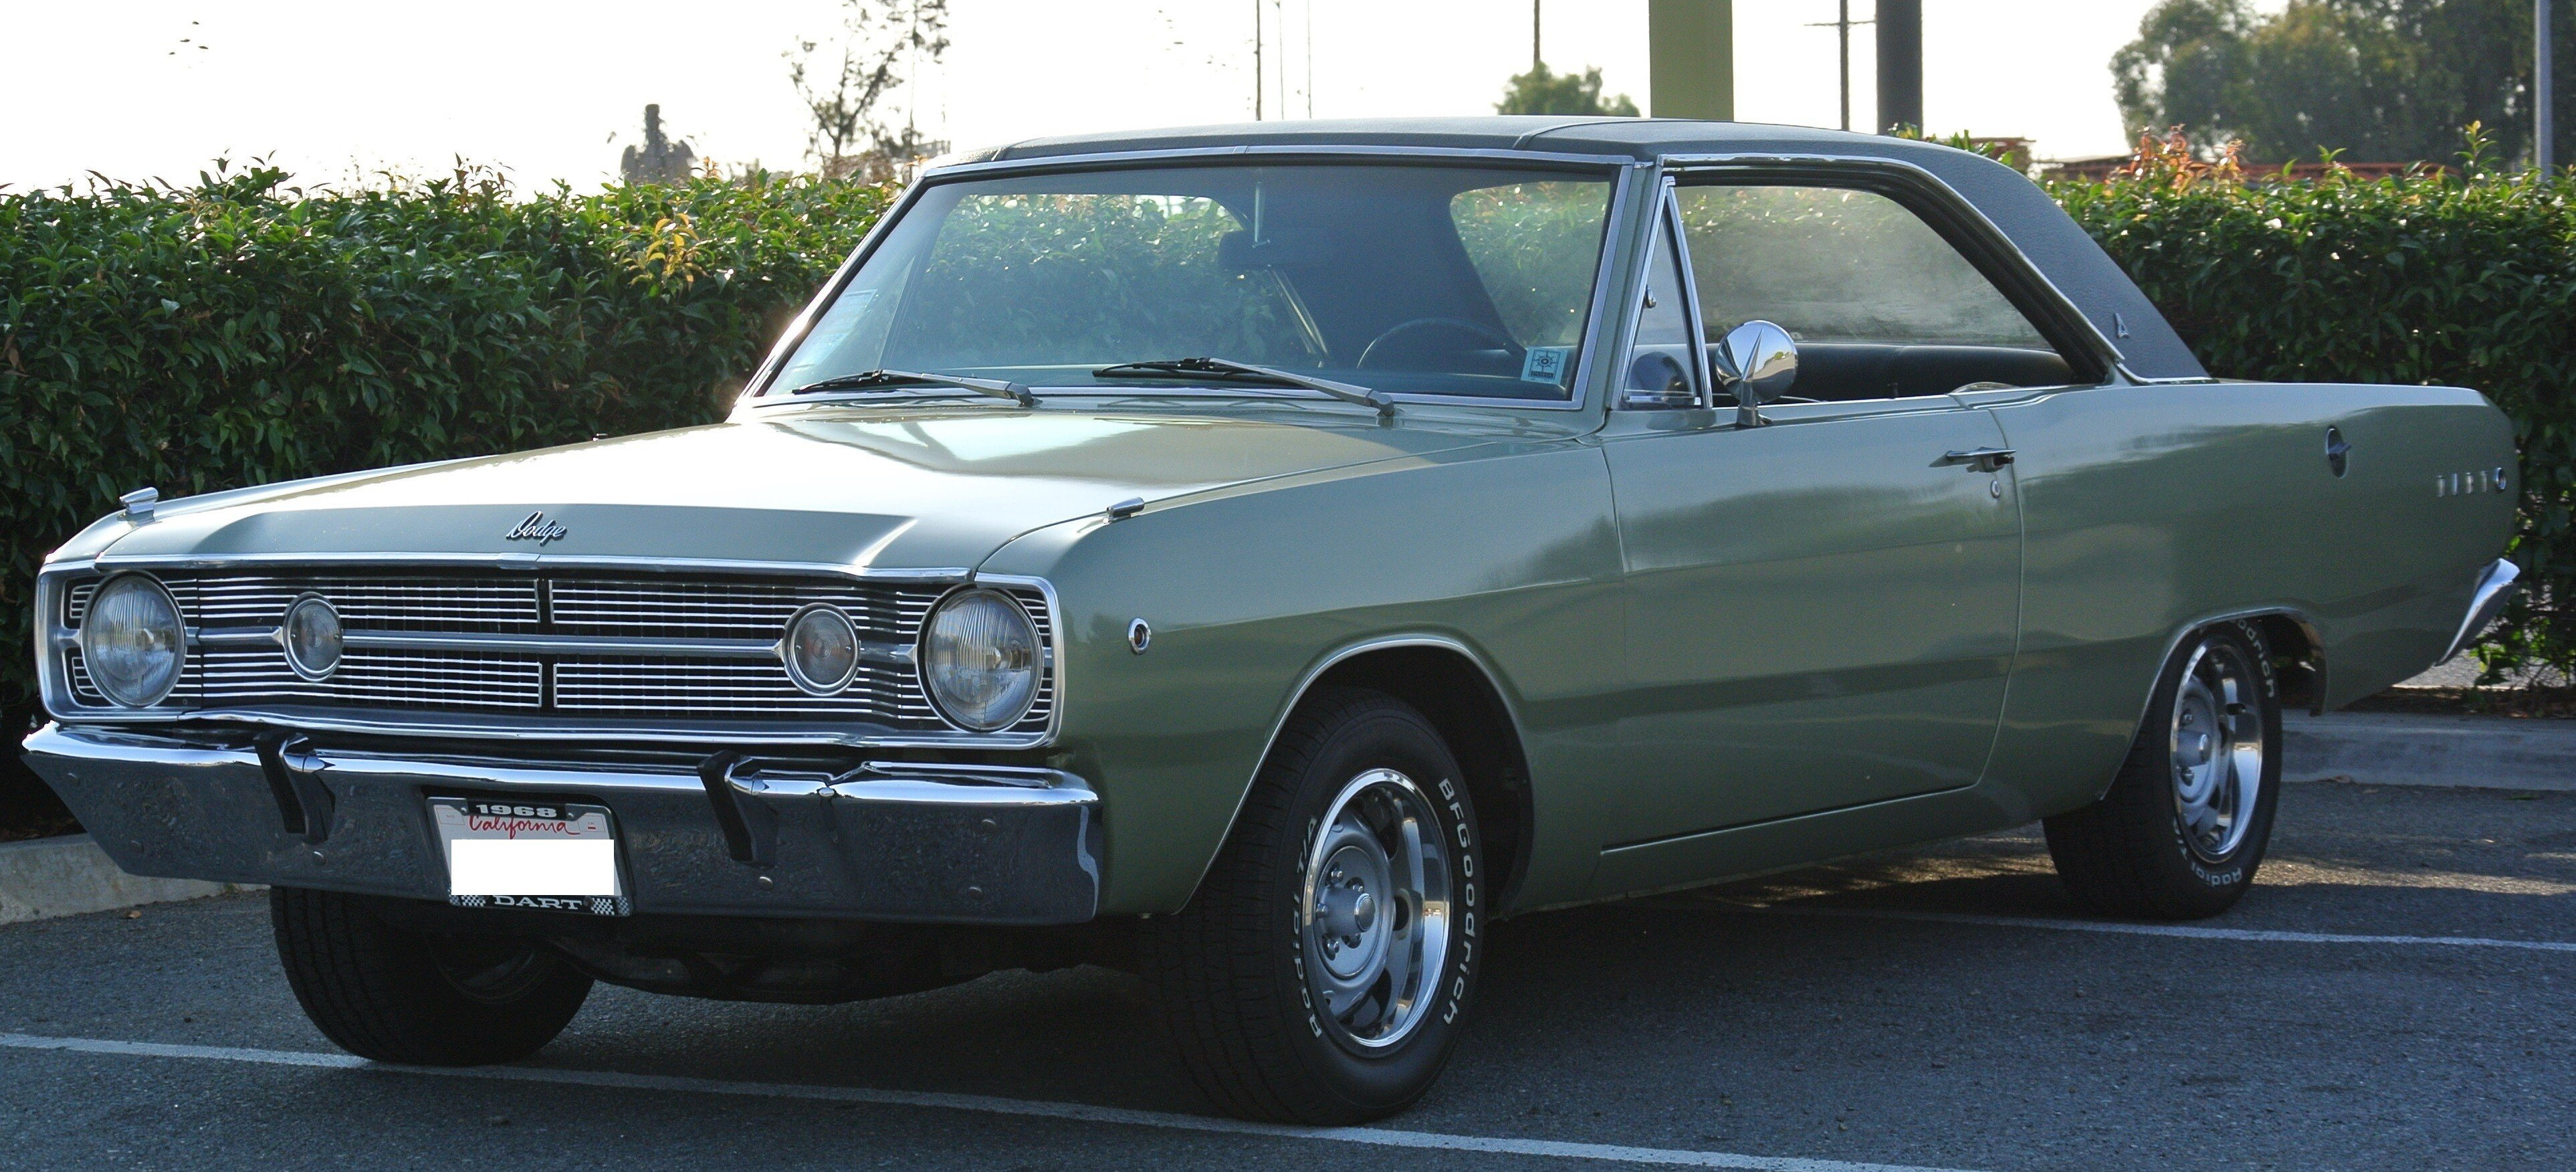 Dodge Dart 1968 Owner S Manual 68 Dart Car Manuals Literature Vehicle Parts Accessories